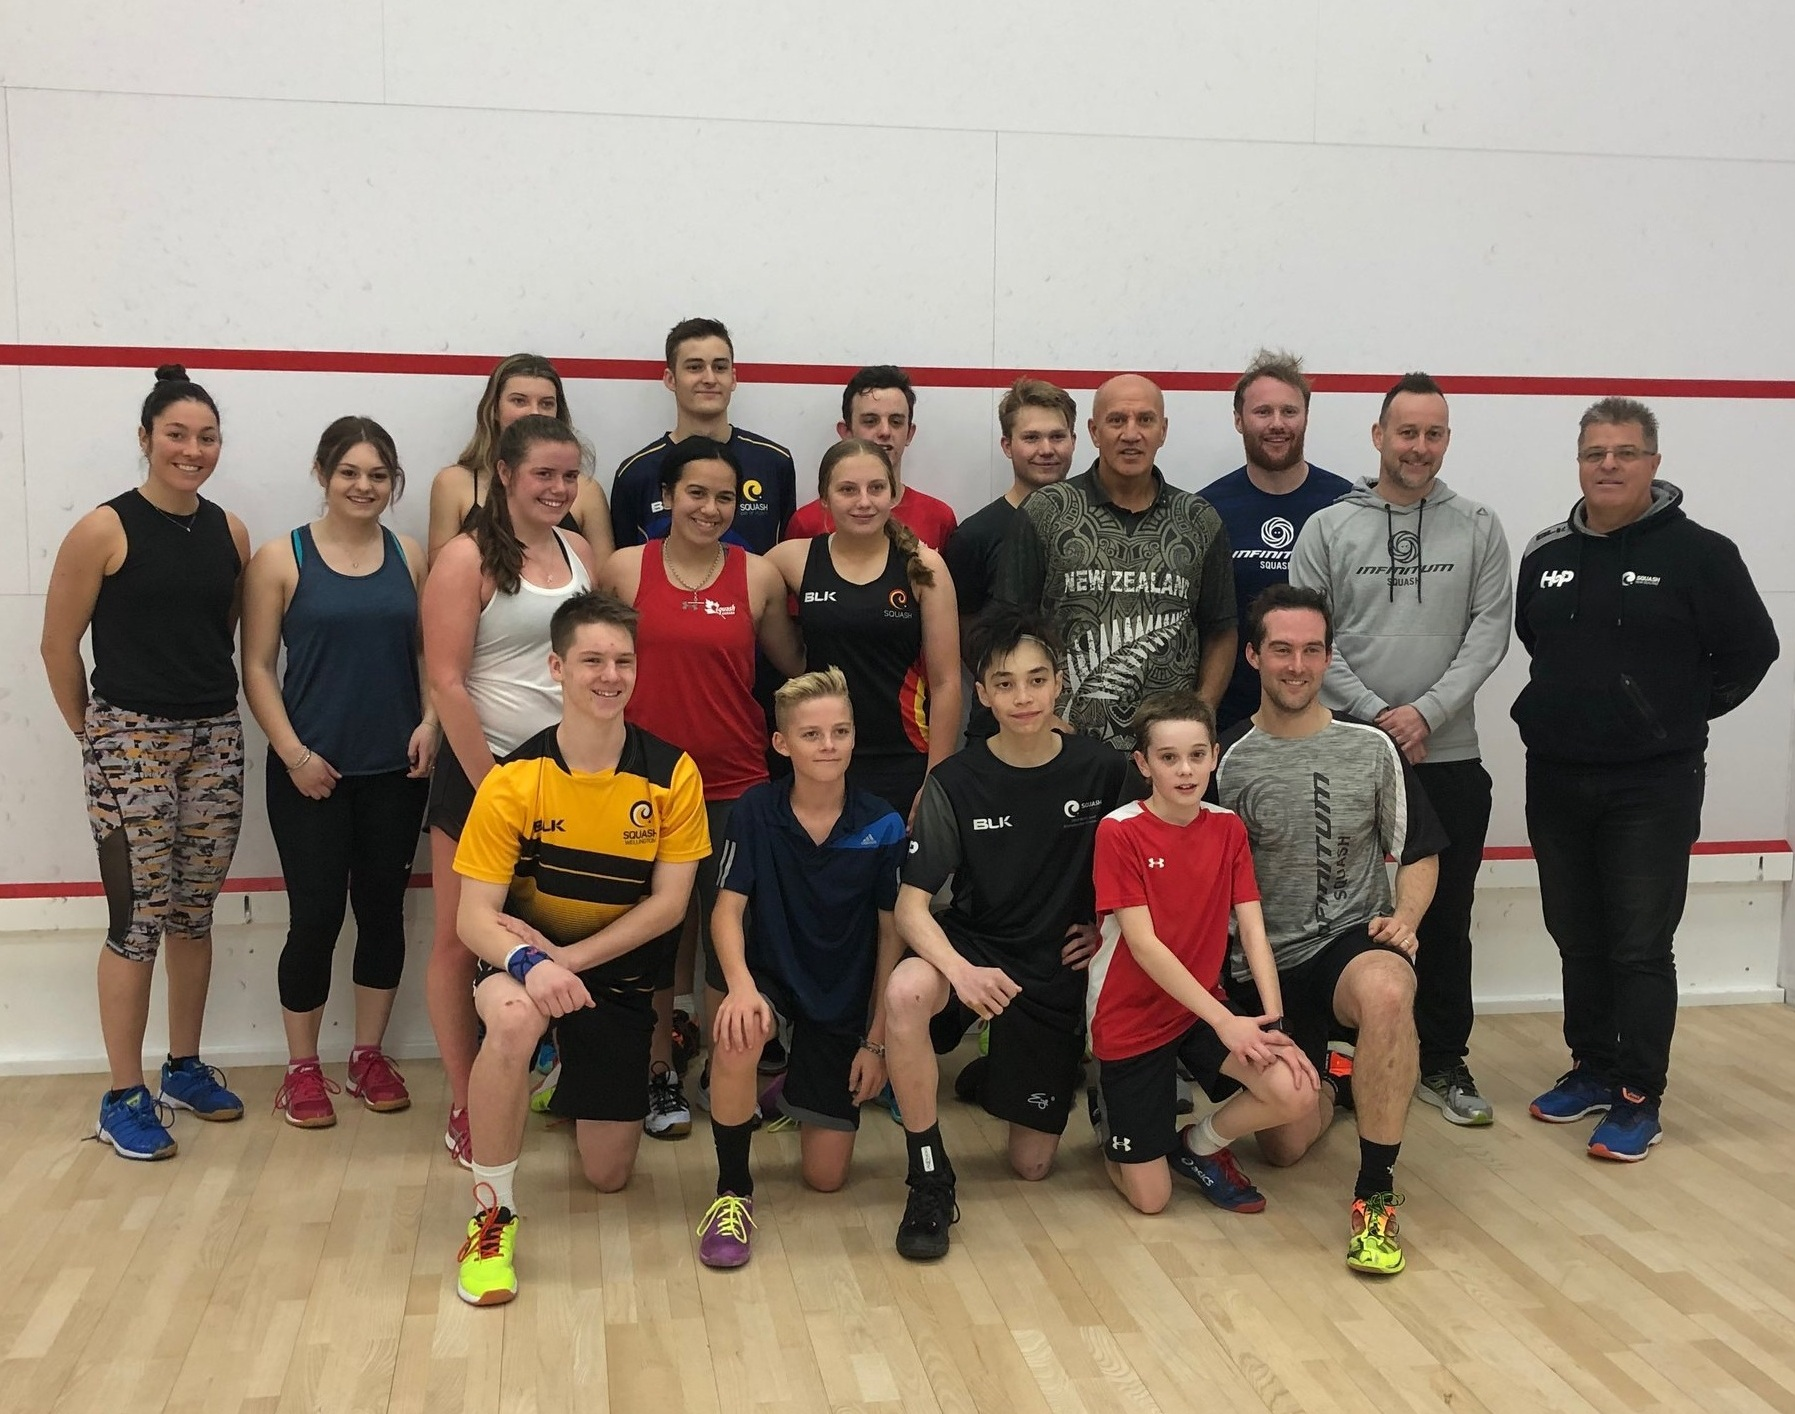 INFINITUM Squash Summer 2019 Camps - Beginner Camps, Junior Development Camps, Tournament Preparatory Mini Camps